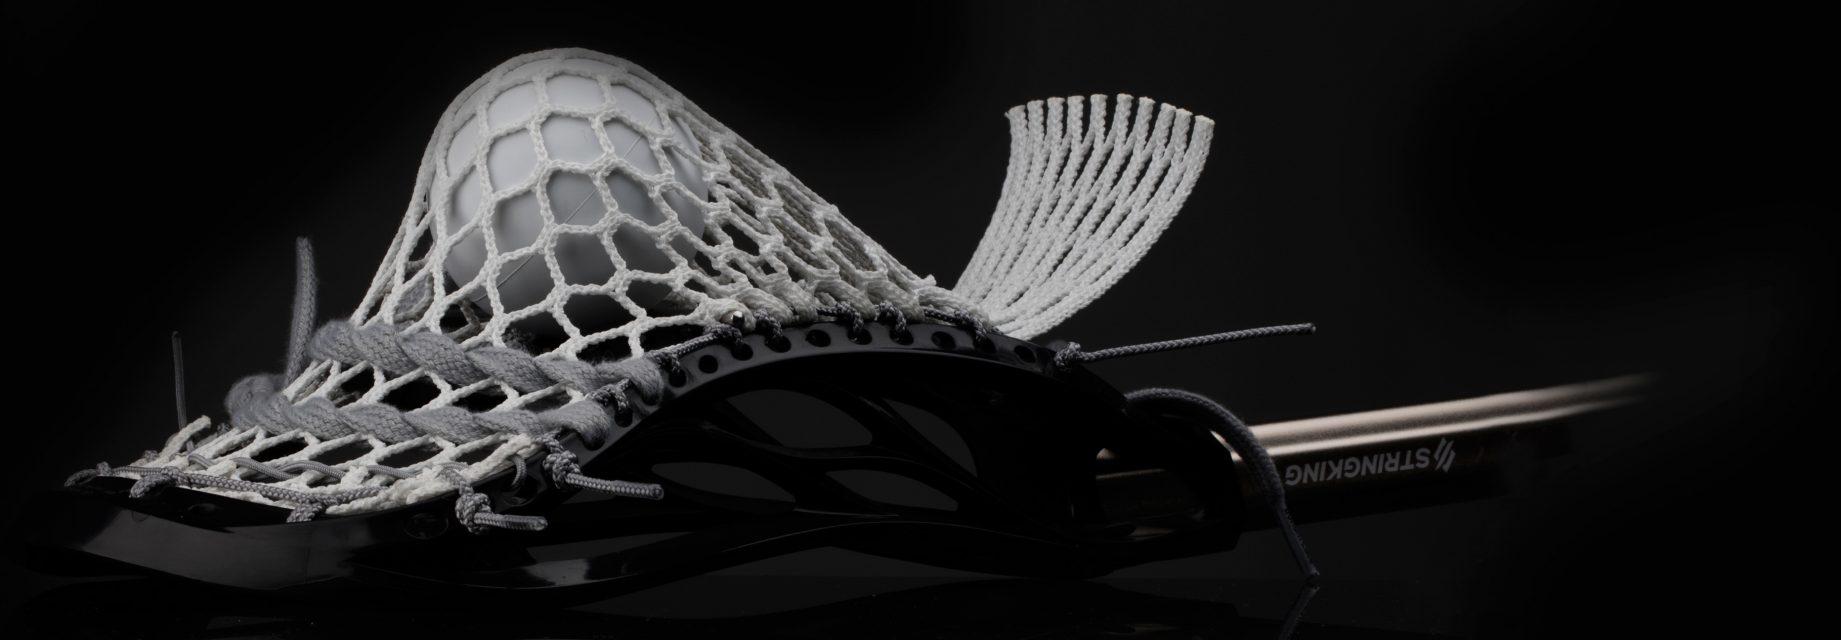 StringKing Type 3 Performance Lacrosse Mesh Pocket Performance